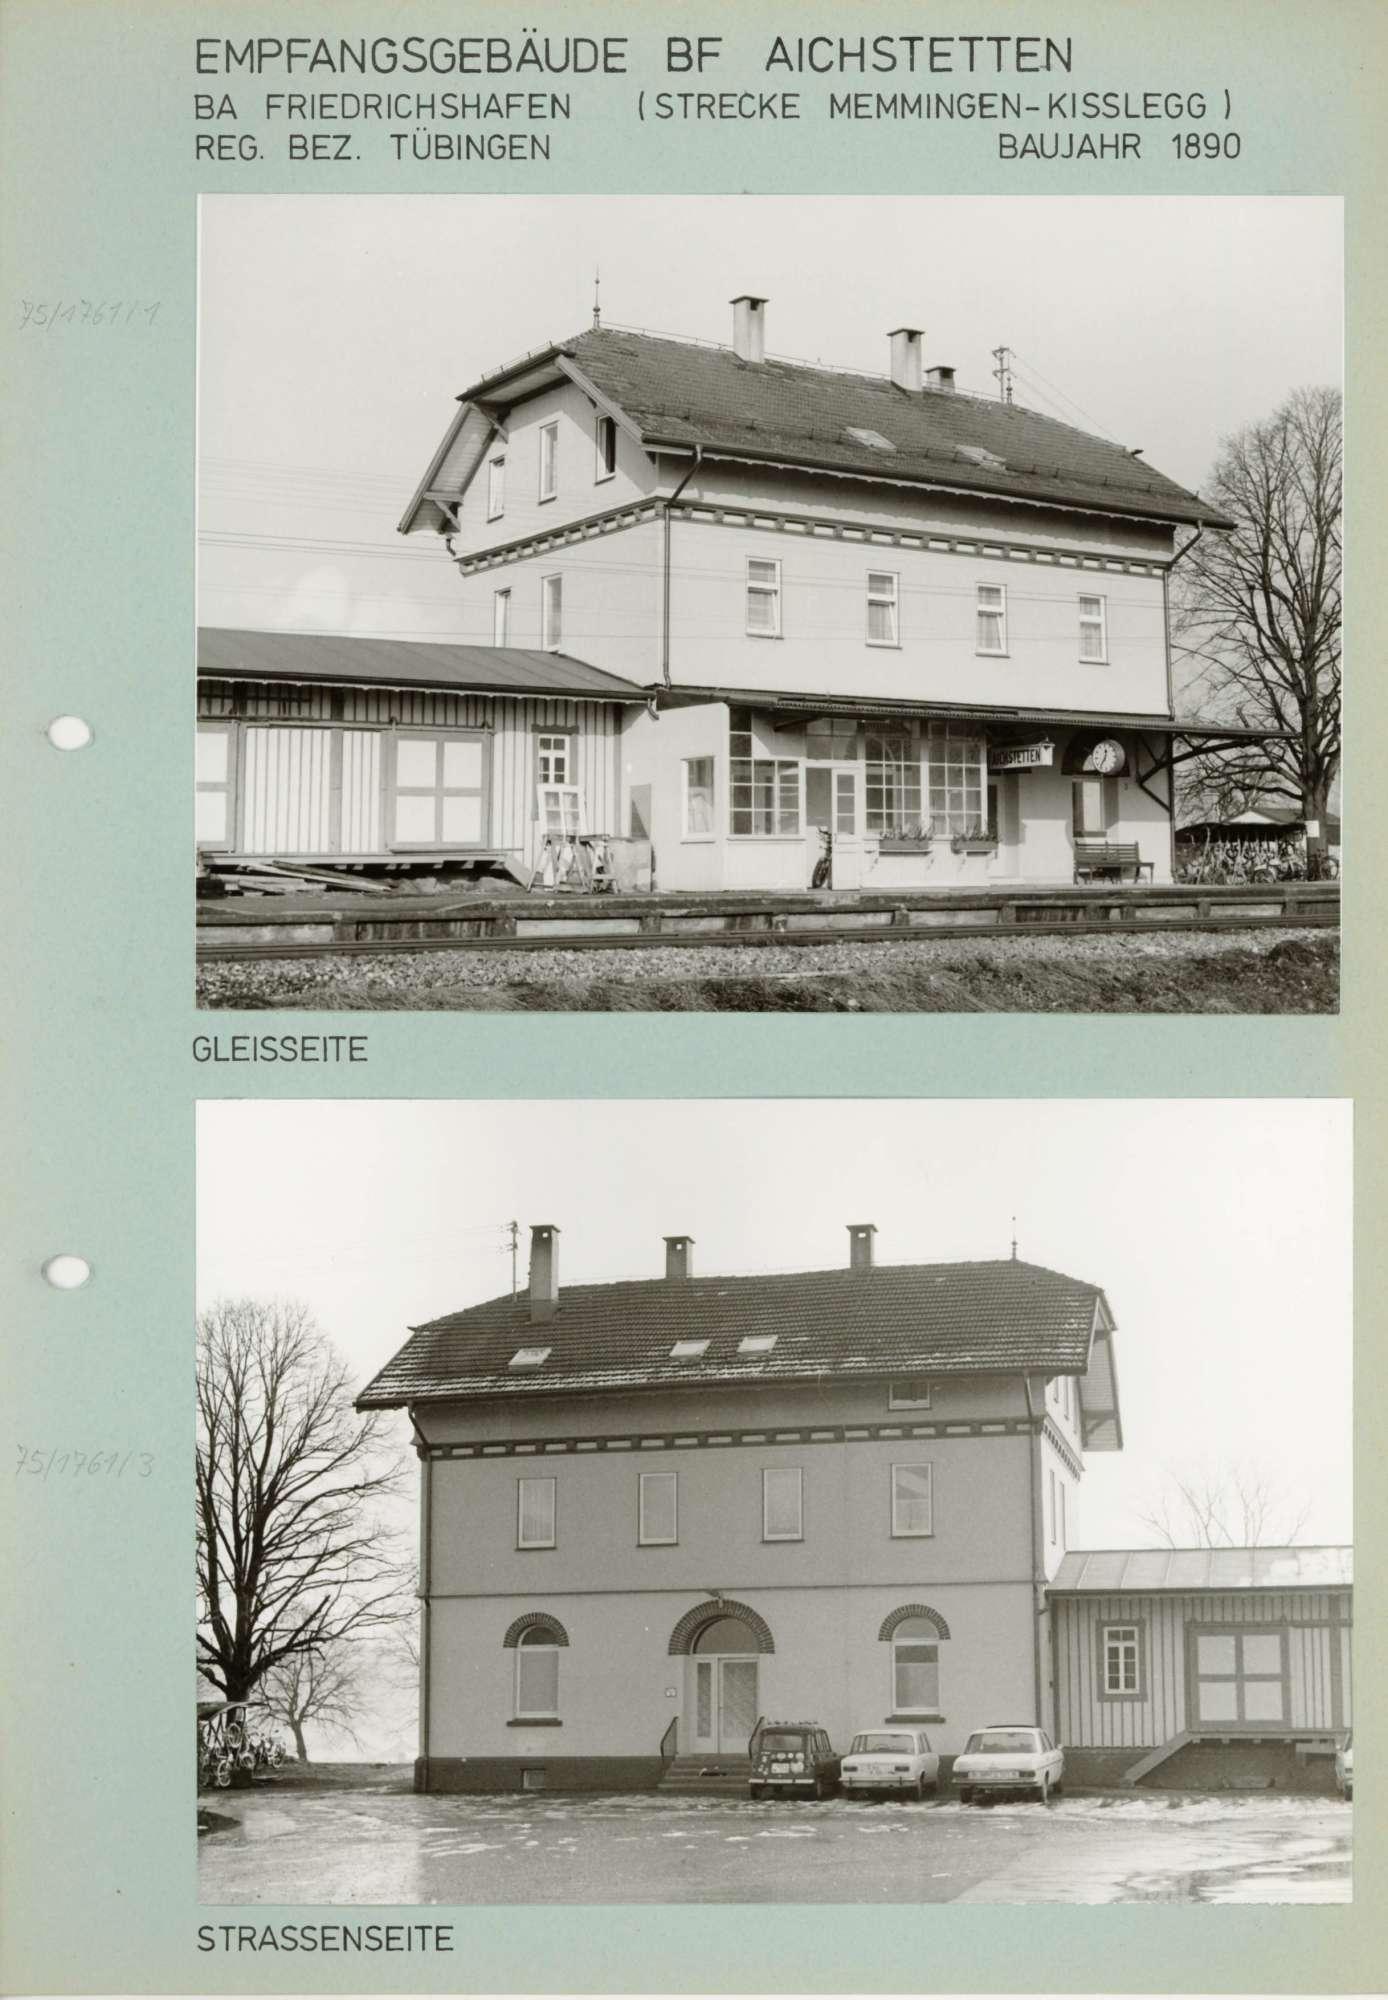 Aichstetten: 4 Fotos, Bild 2